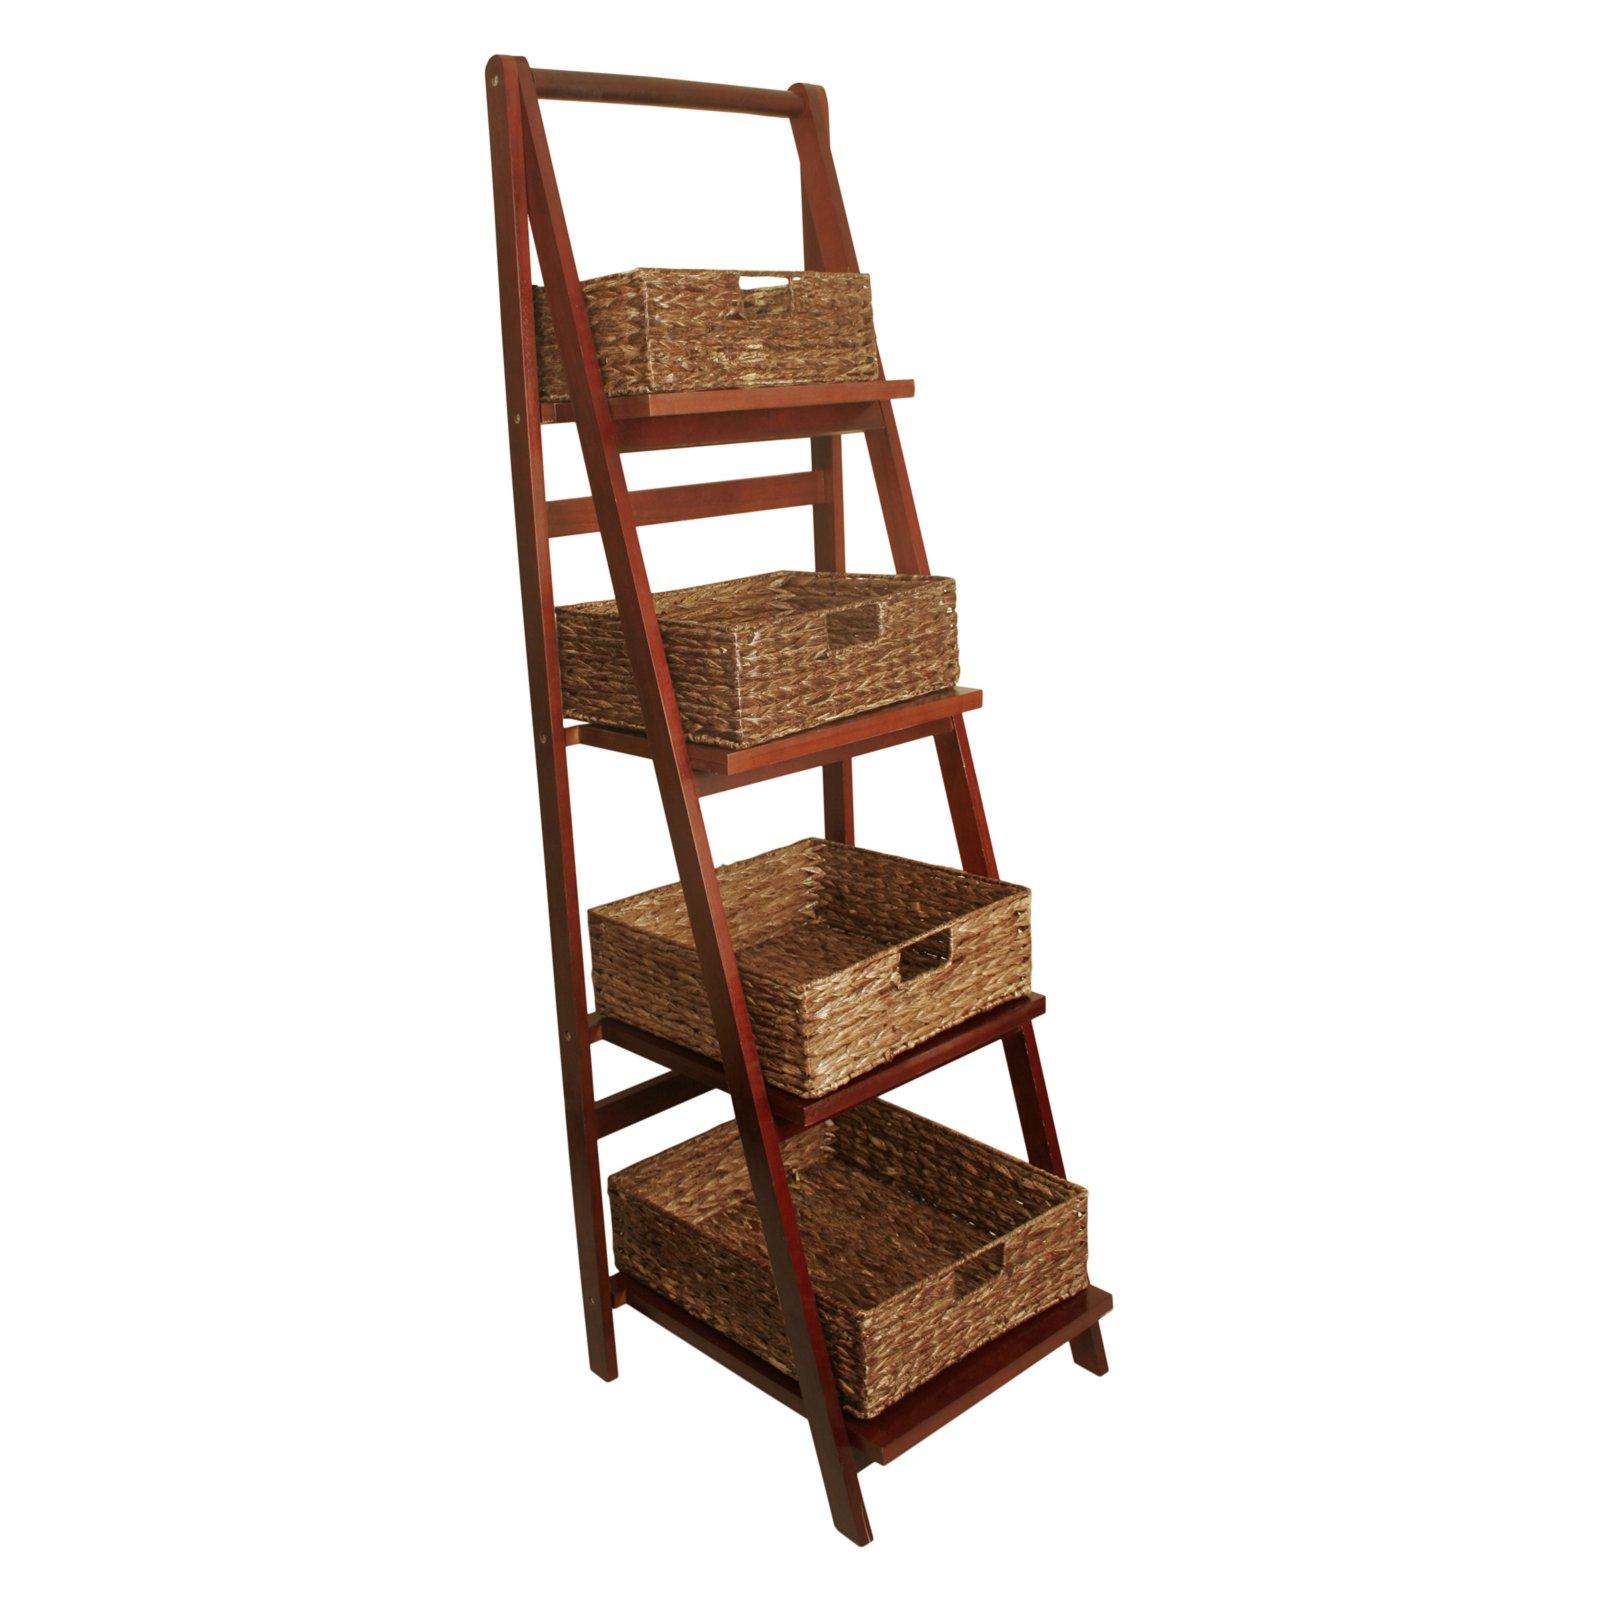 Wald Import Ladder Shelf With Storage Baskets Wall Ladders